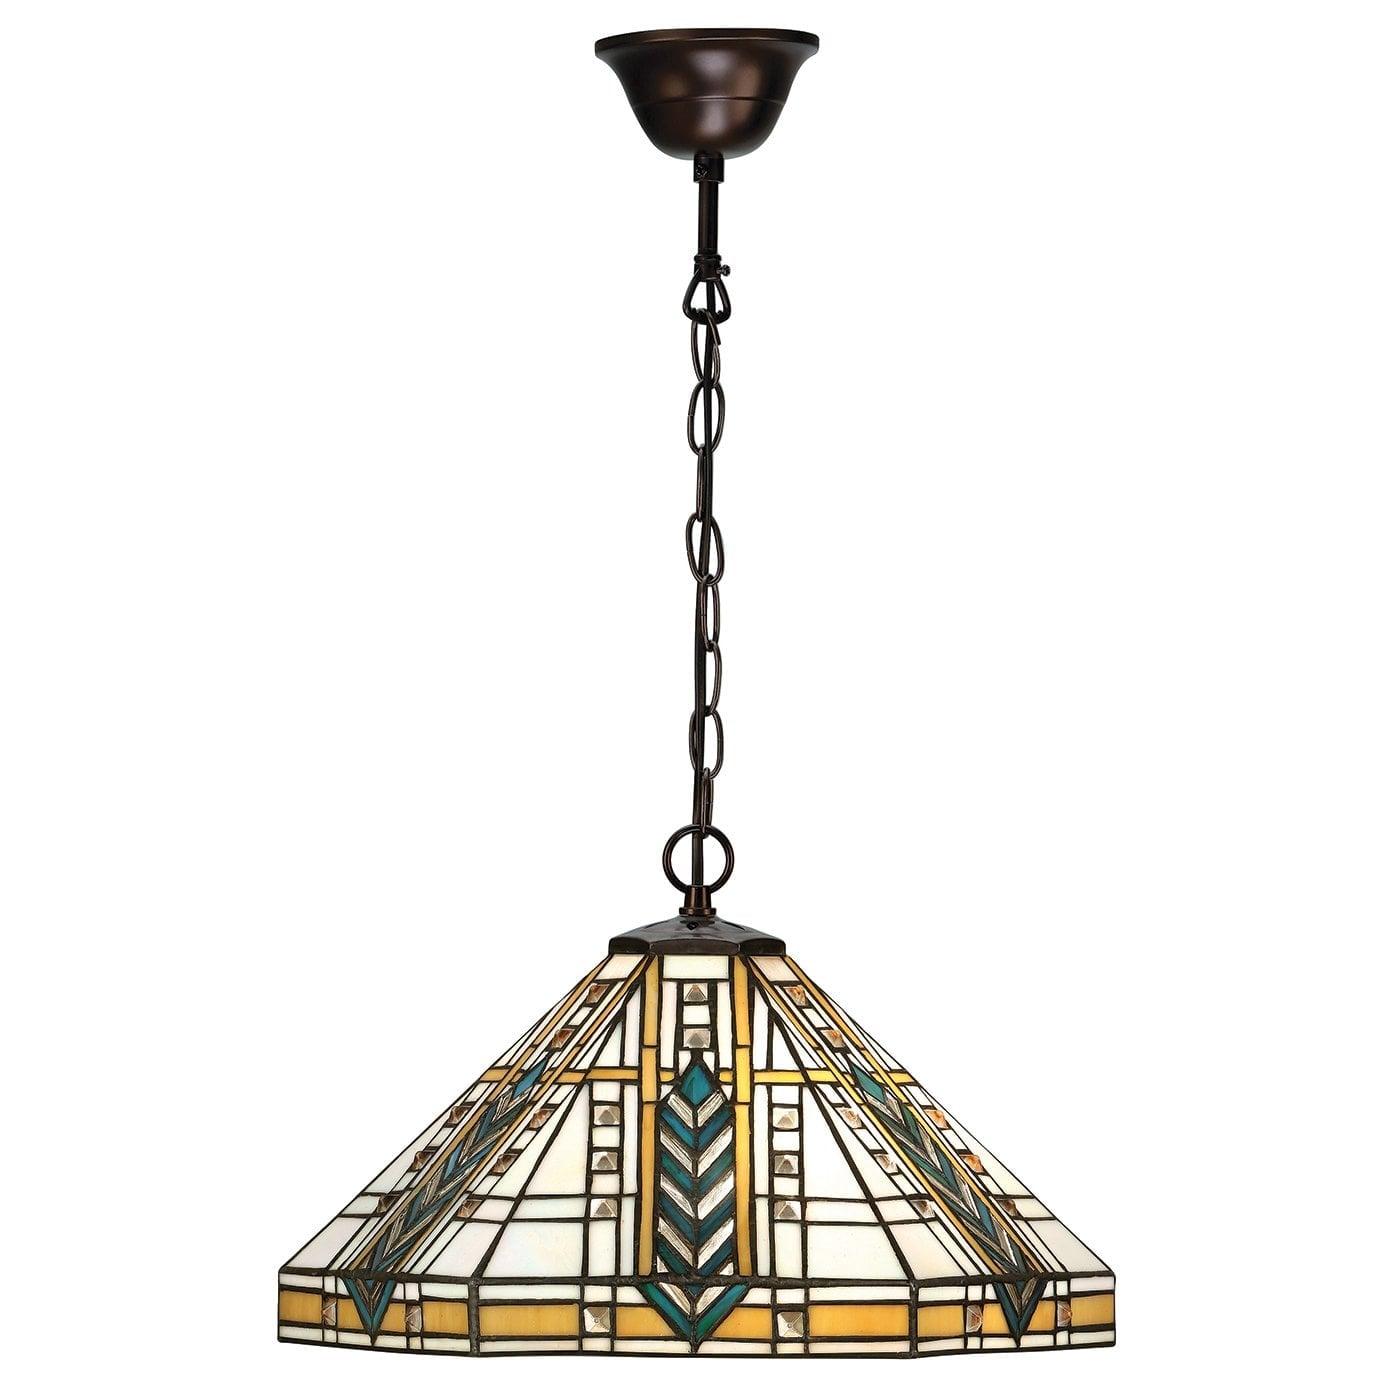 Interiors 1900 64238 Lloyd Medium 1lt pendant, Tiffany